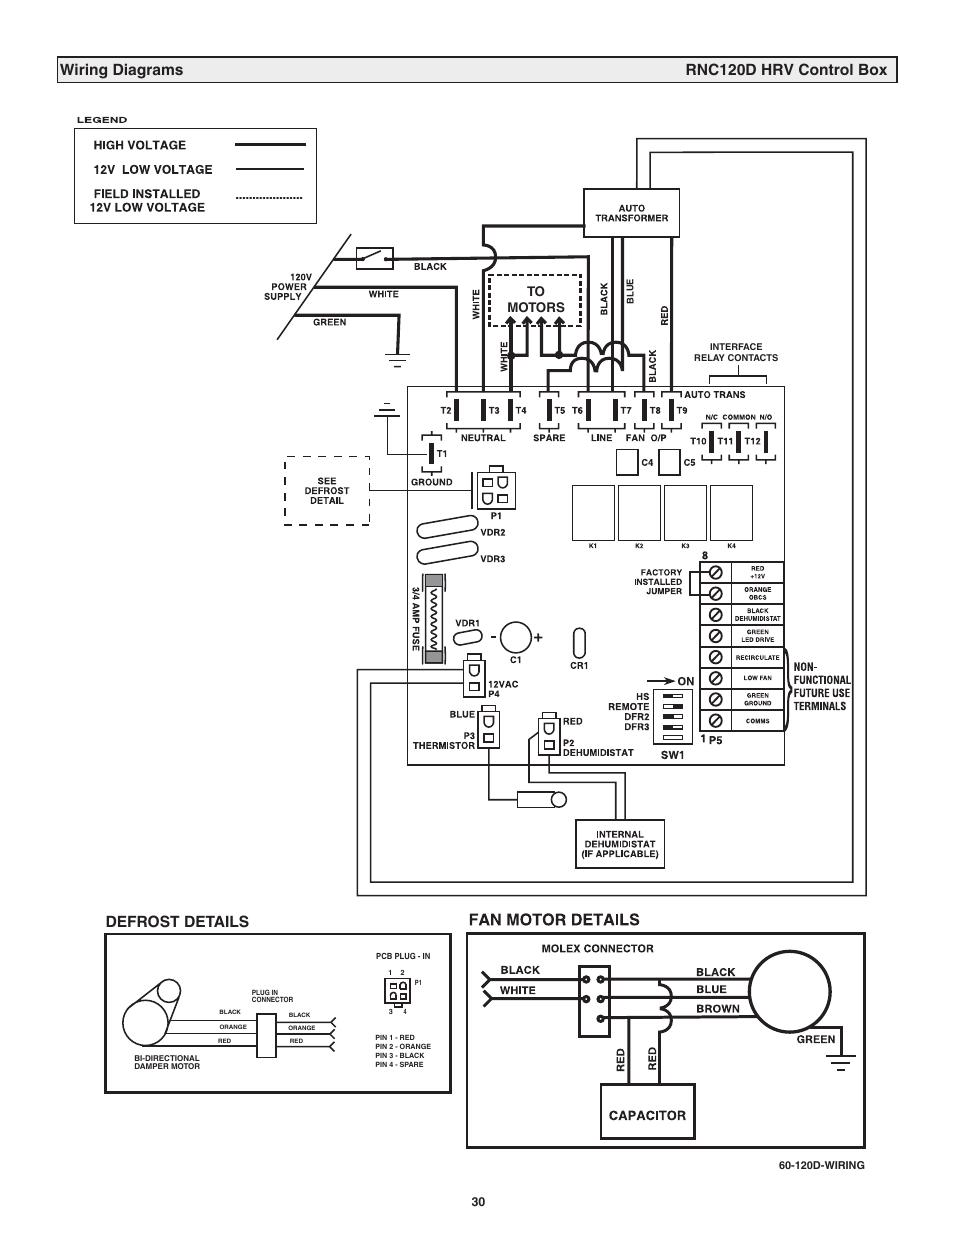 [DIAGRAM] Bmw 120d Wiring Diagram FULL Version HD Quality